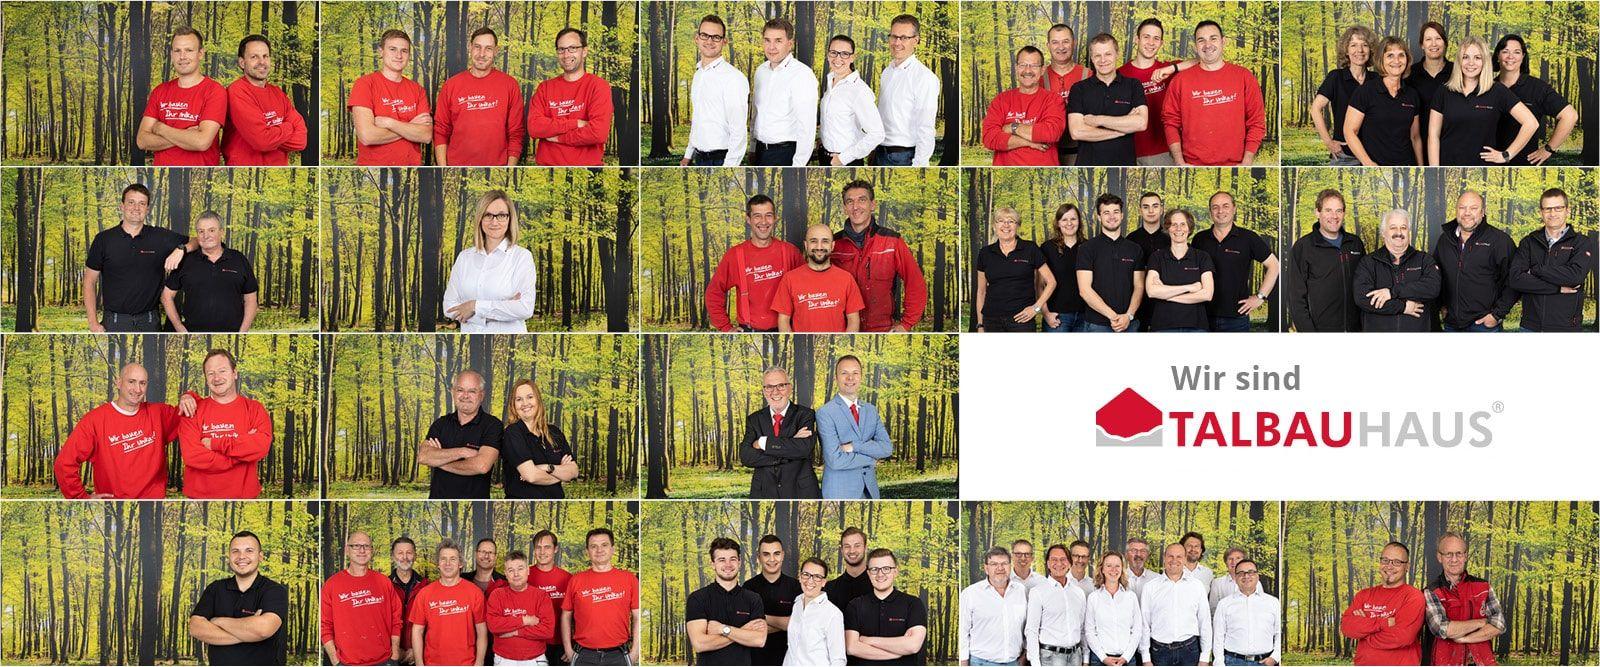 Die Teams der TALBAU-Haus GmbH